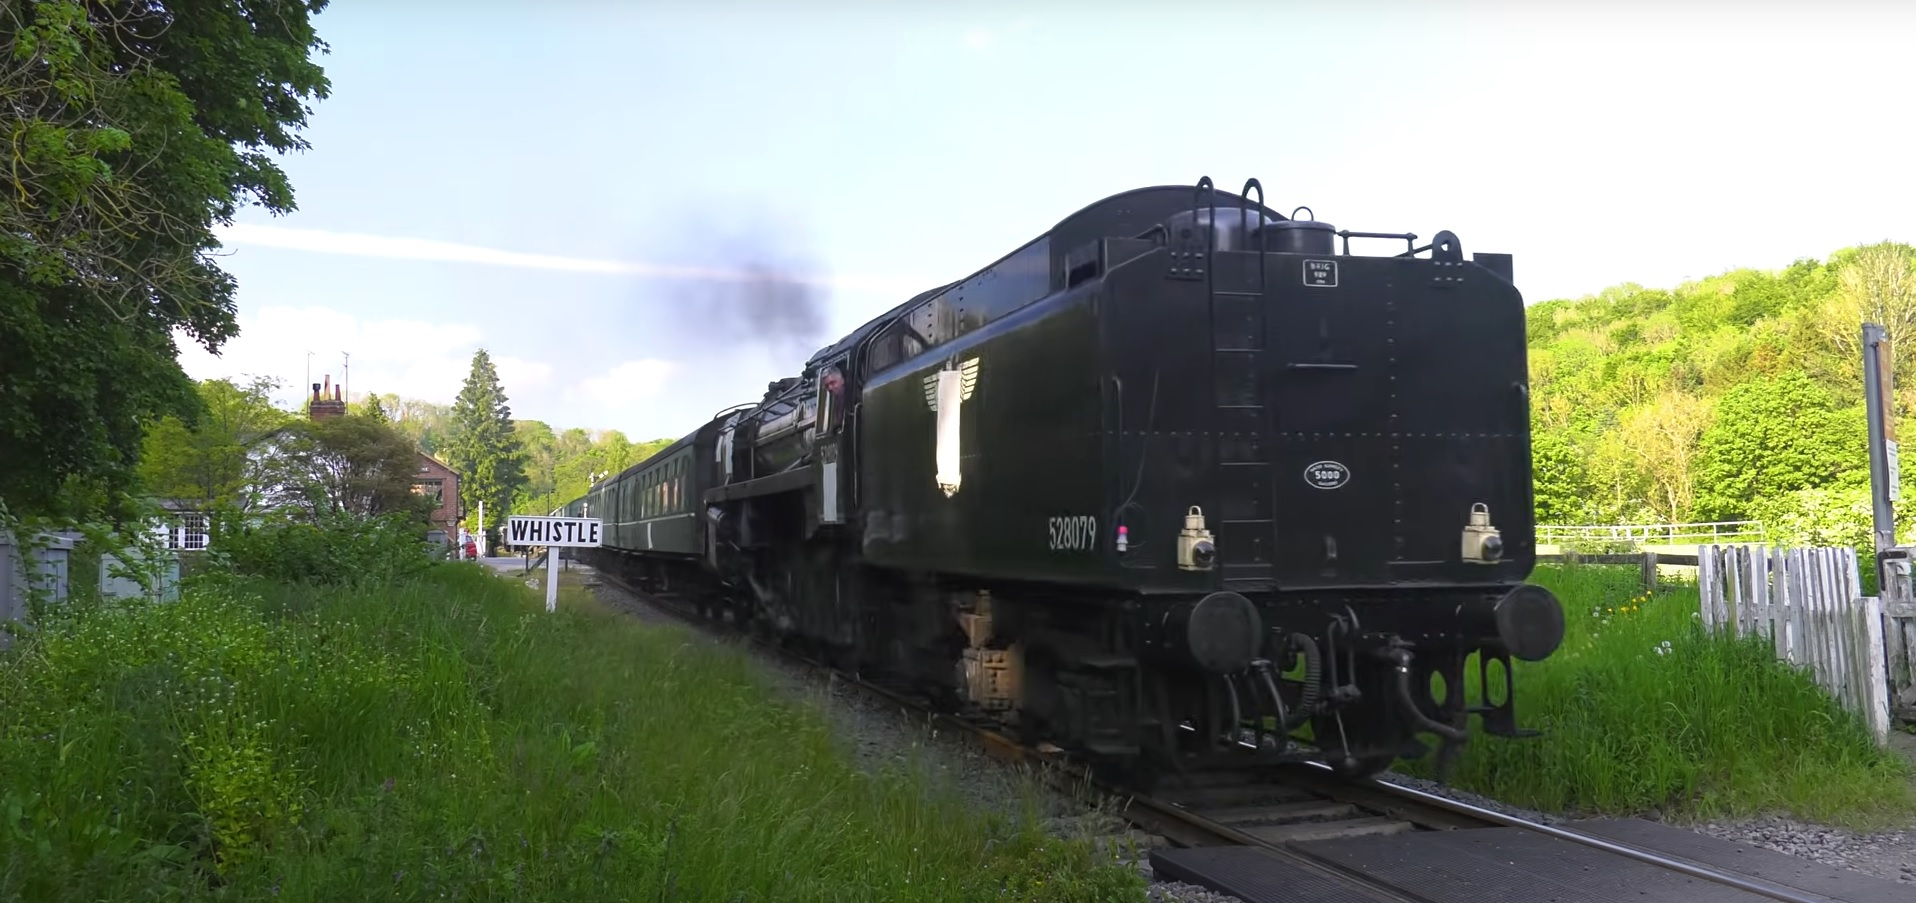 treno indiana jones